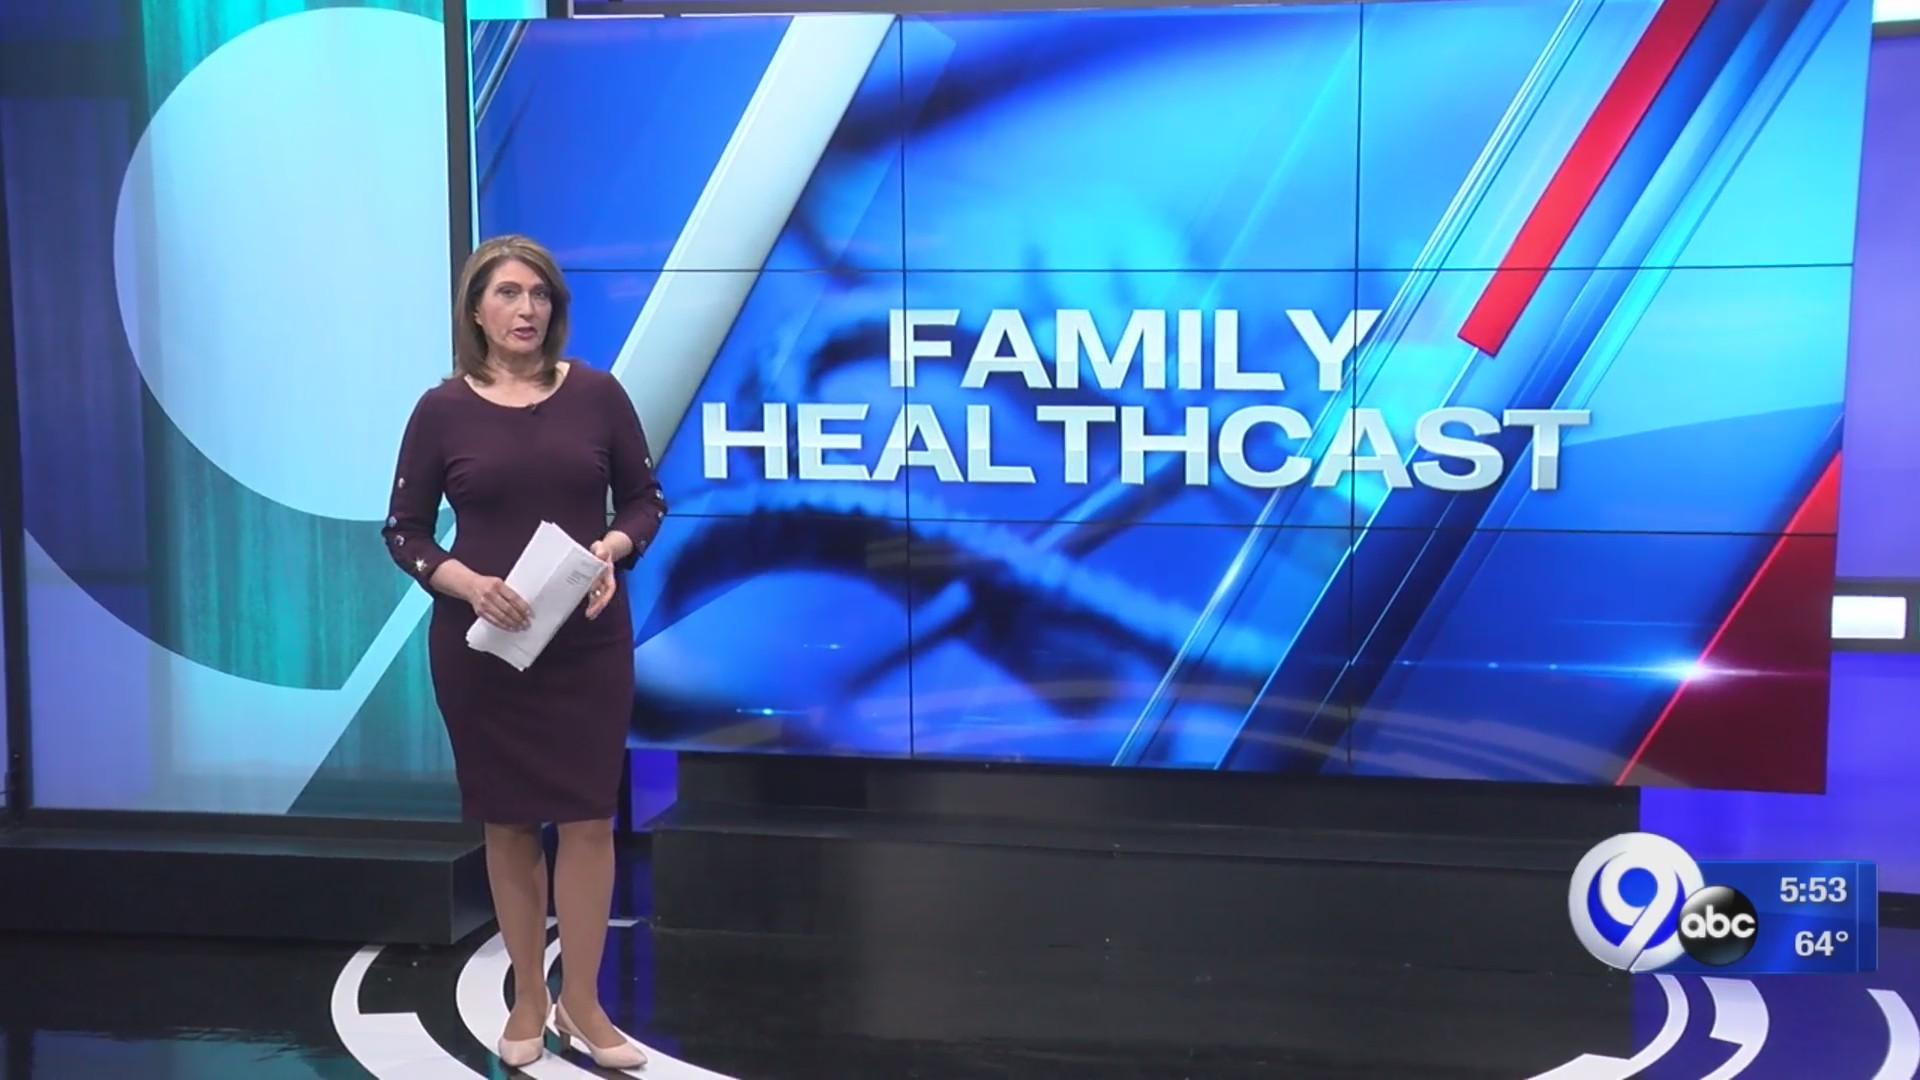 Family_Healthcast_5_20_19_0_20190520215813